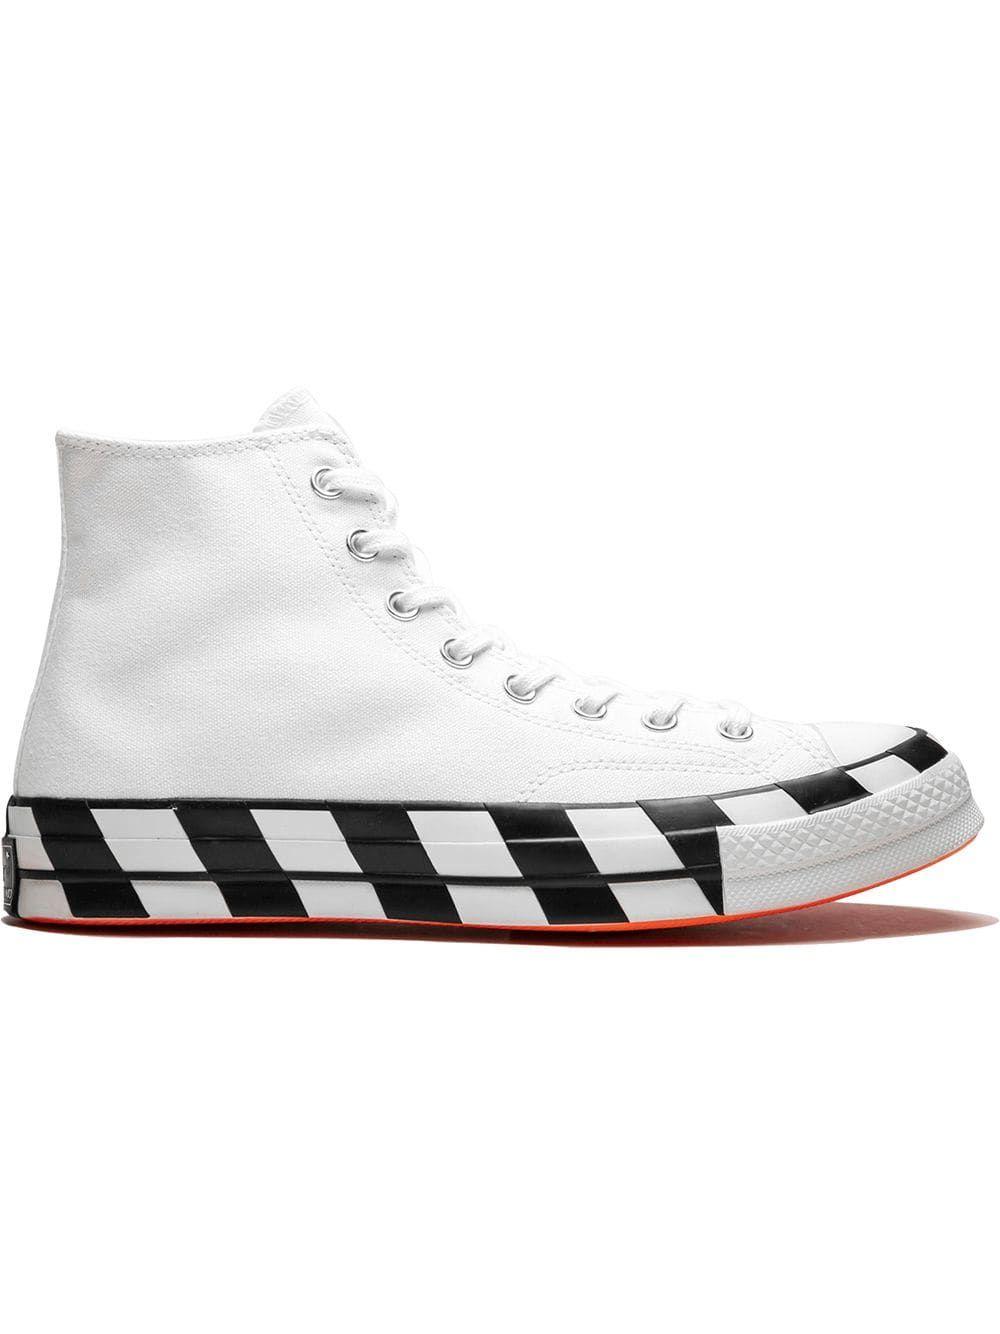 80e007deb18 CONVERSE CONVERSE CHUCK 70 OFF WHITE HI TOP SNEAKERS - WHITE/CONE/BLACK. # converse #shoes